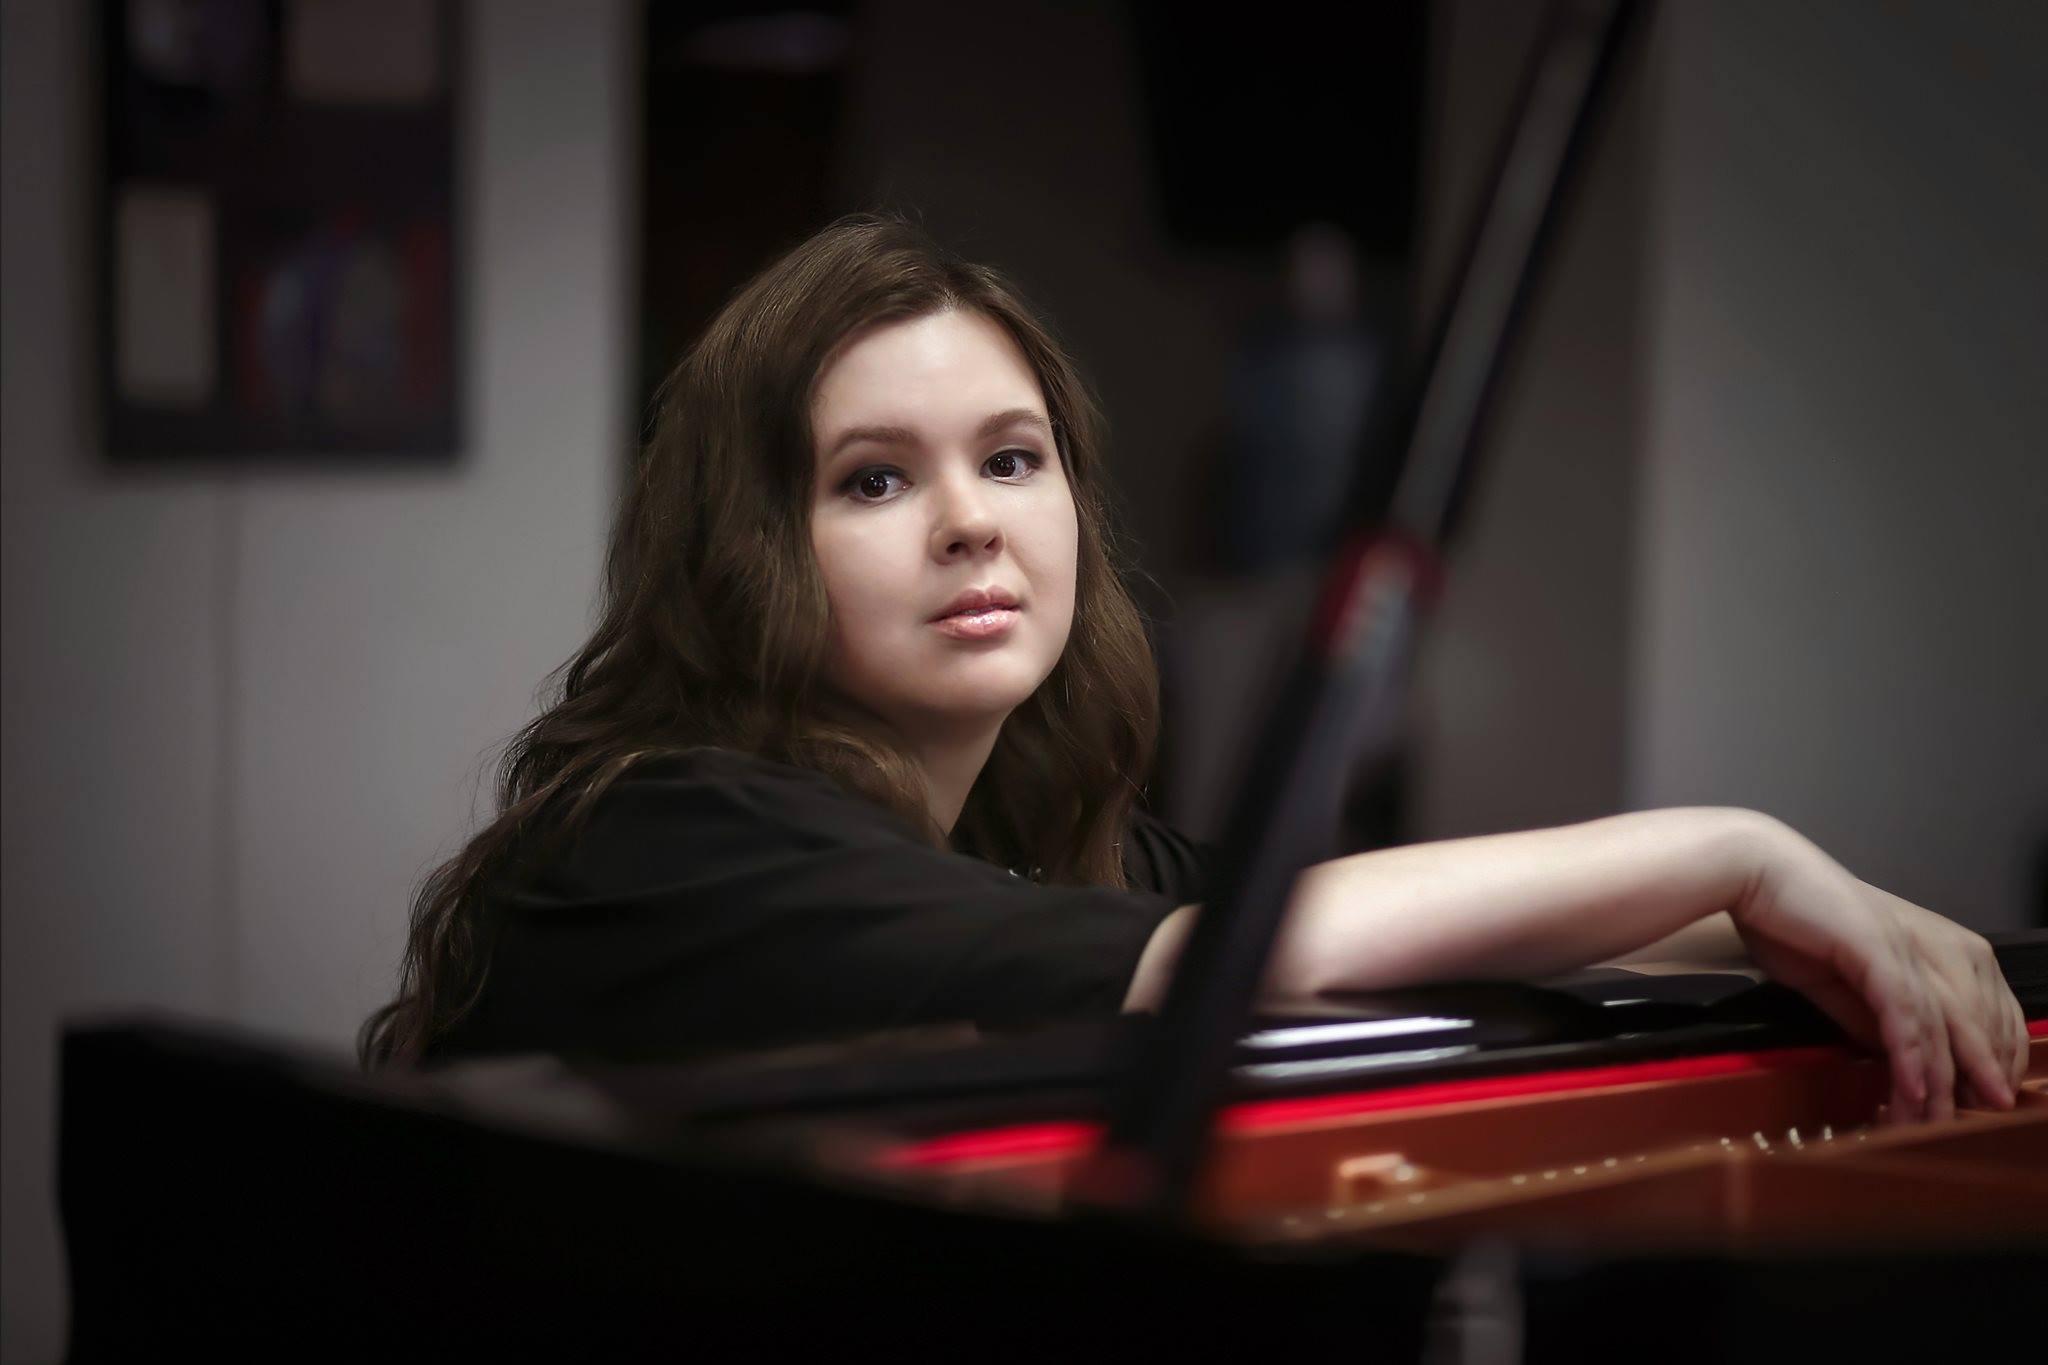 Mariia Narodytska